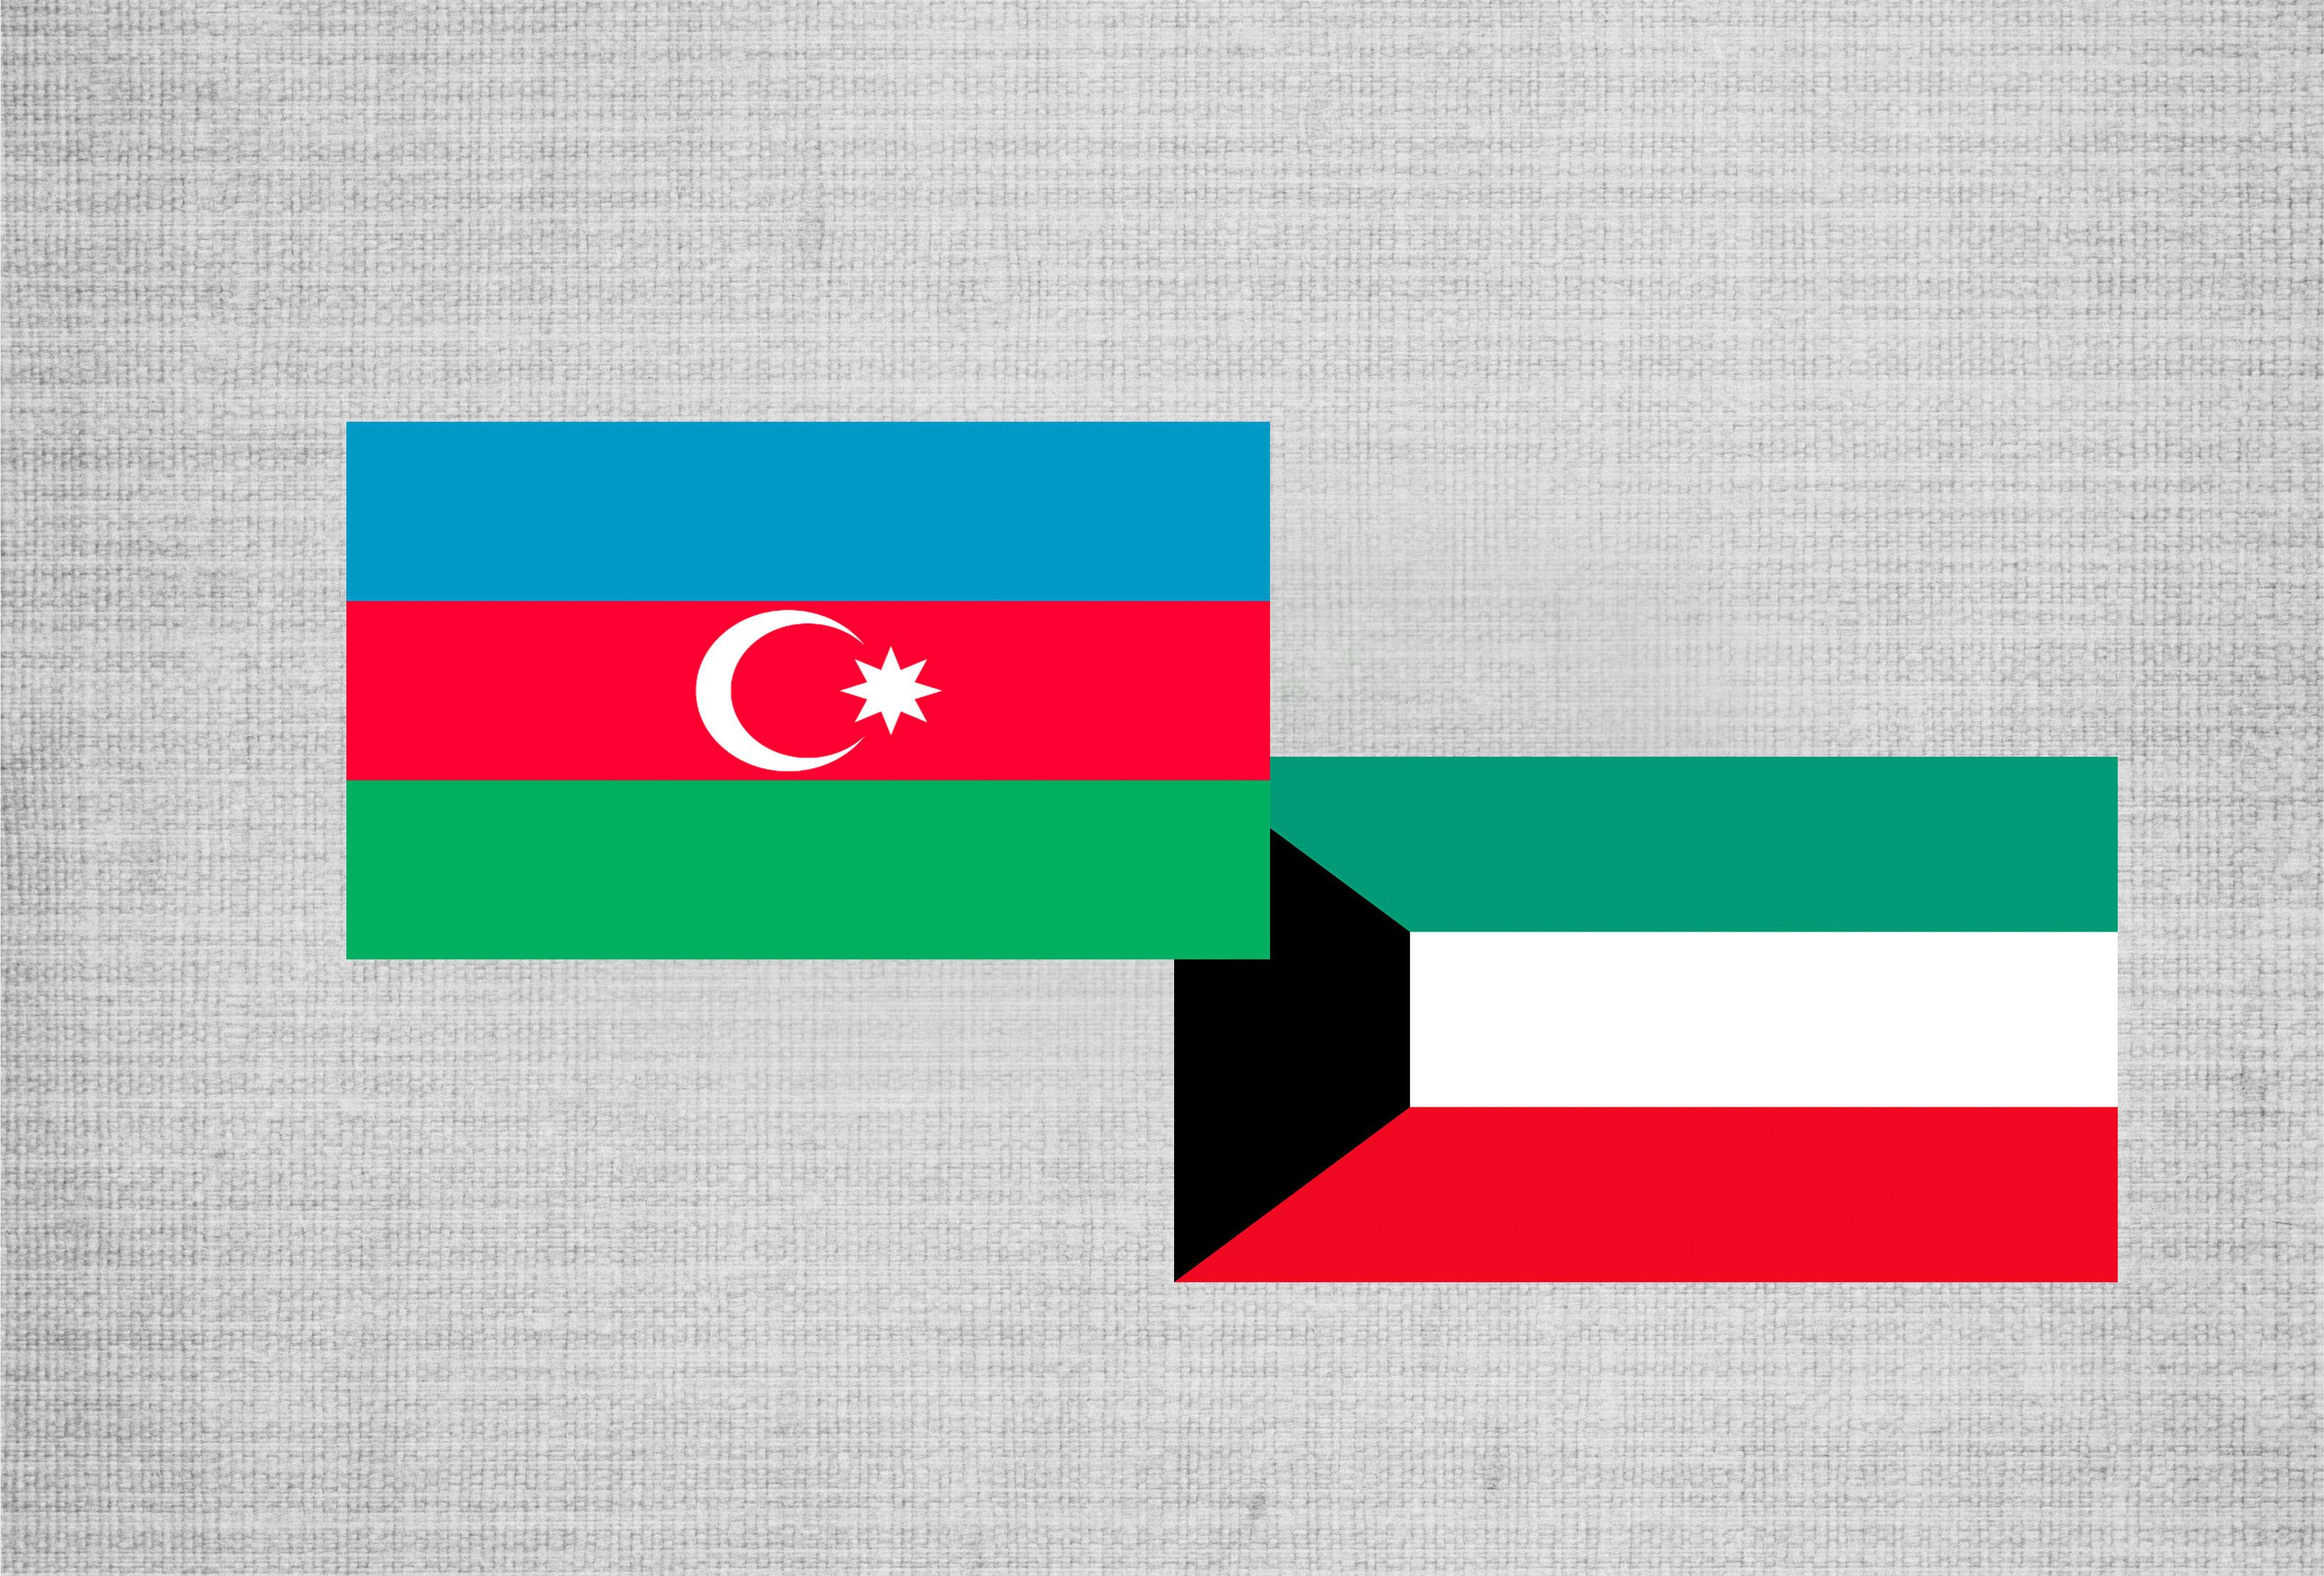 Ежегодно Азербайджан посещают 17 тысяч граждан Кувейта